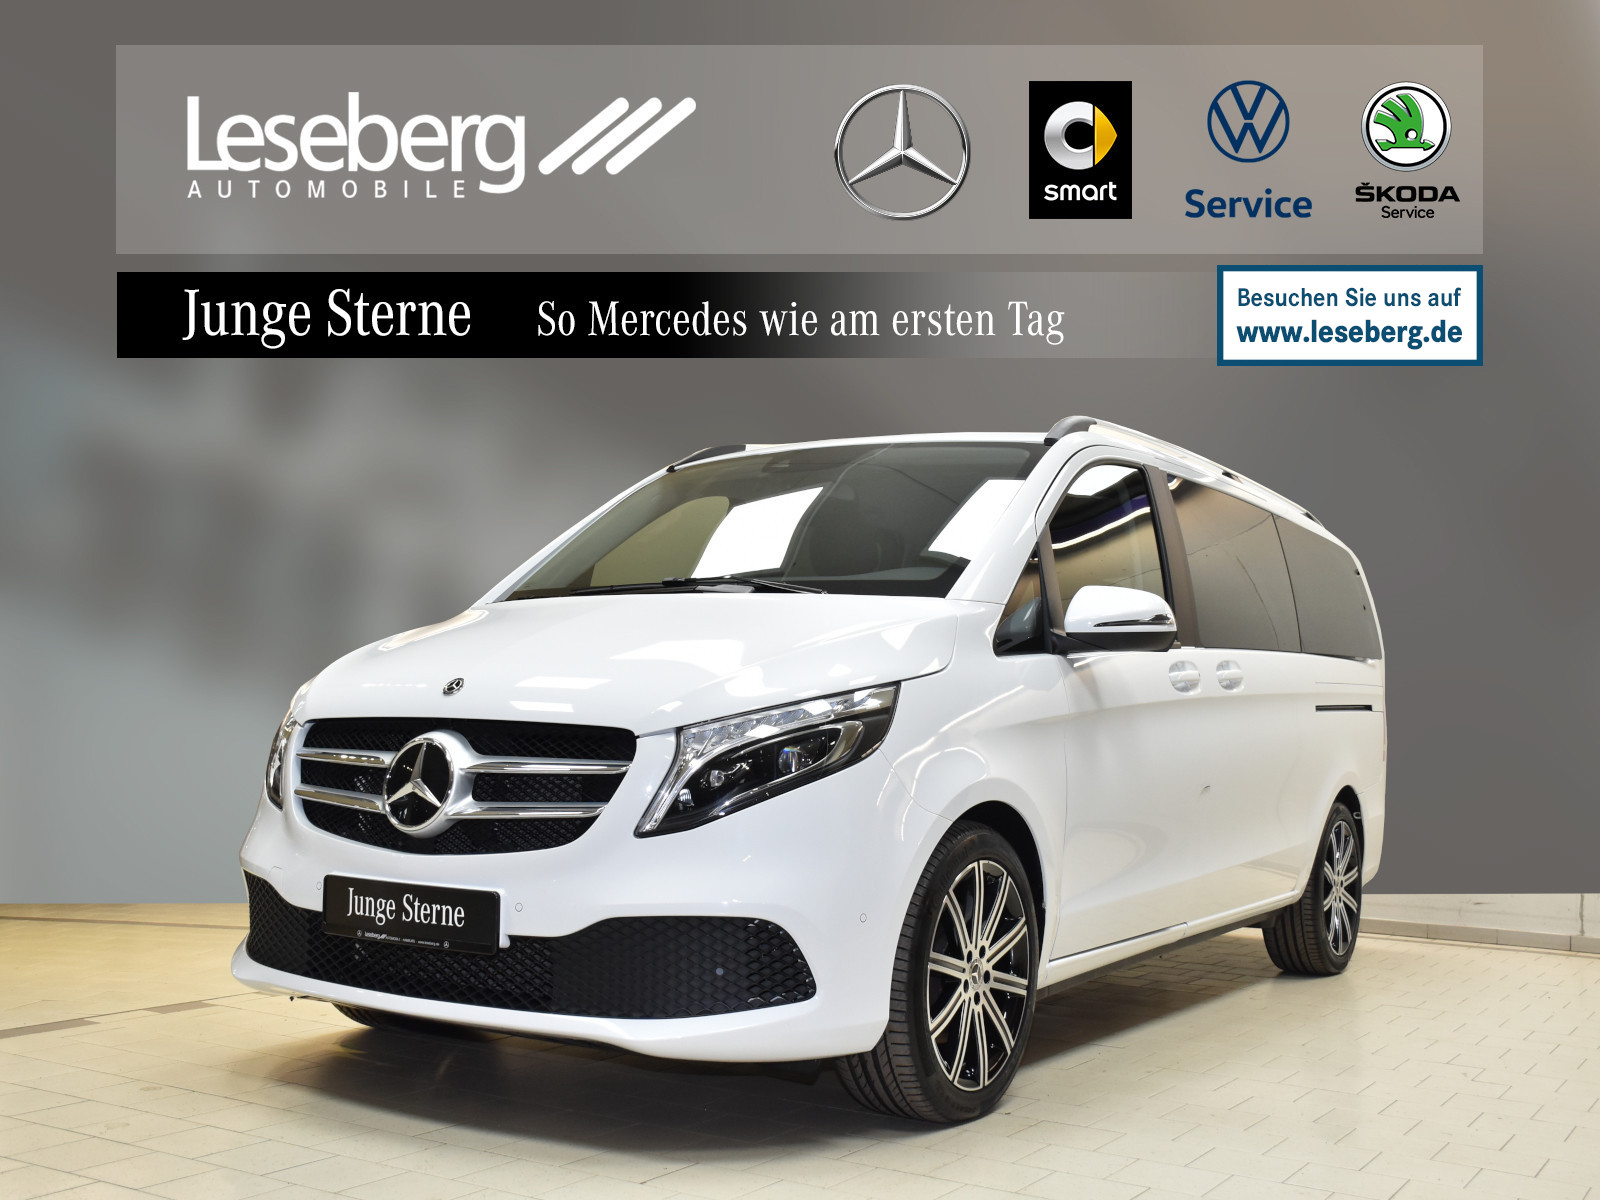 Mercedes-Benz V 300 d EDITION Lang 7Sitze/Kamera/9G/AHK/Navi, Jahr 2020, Diesel